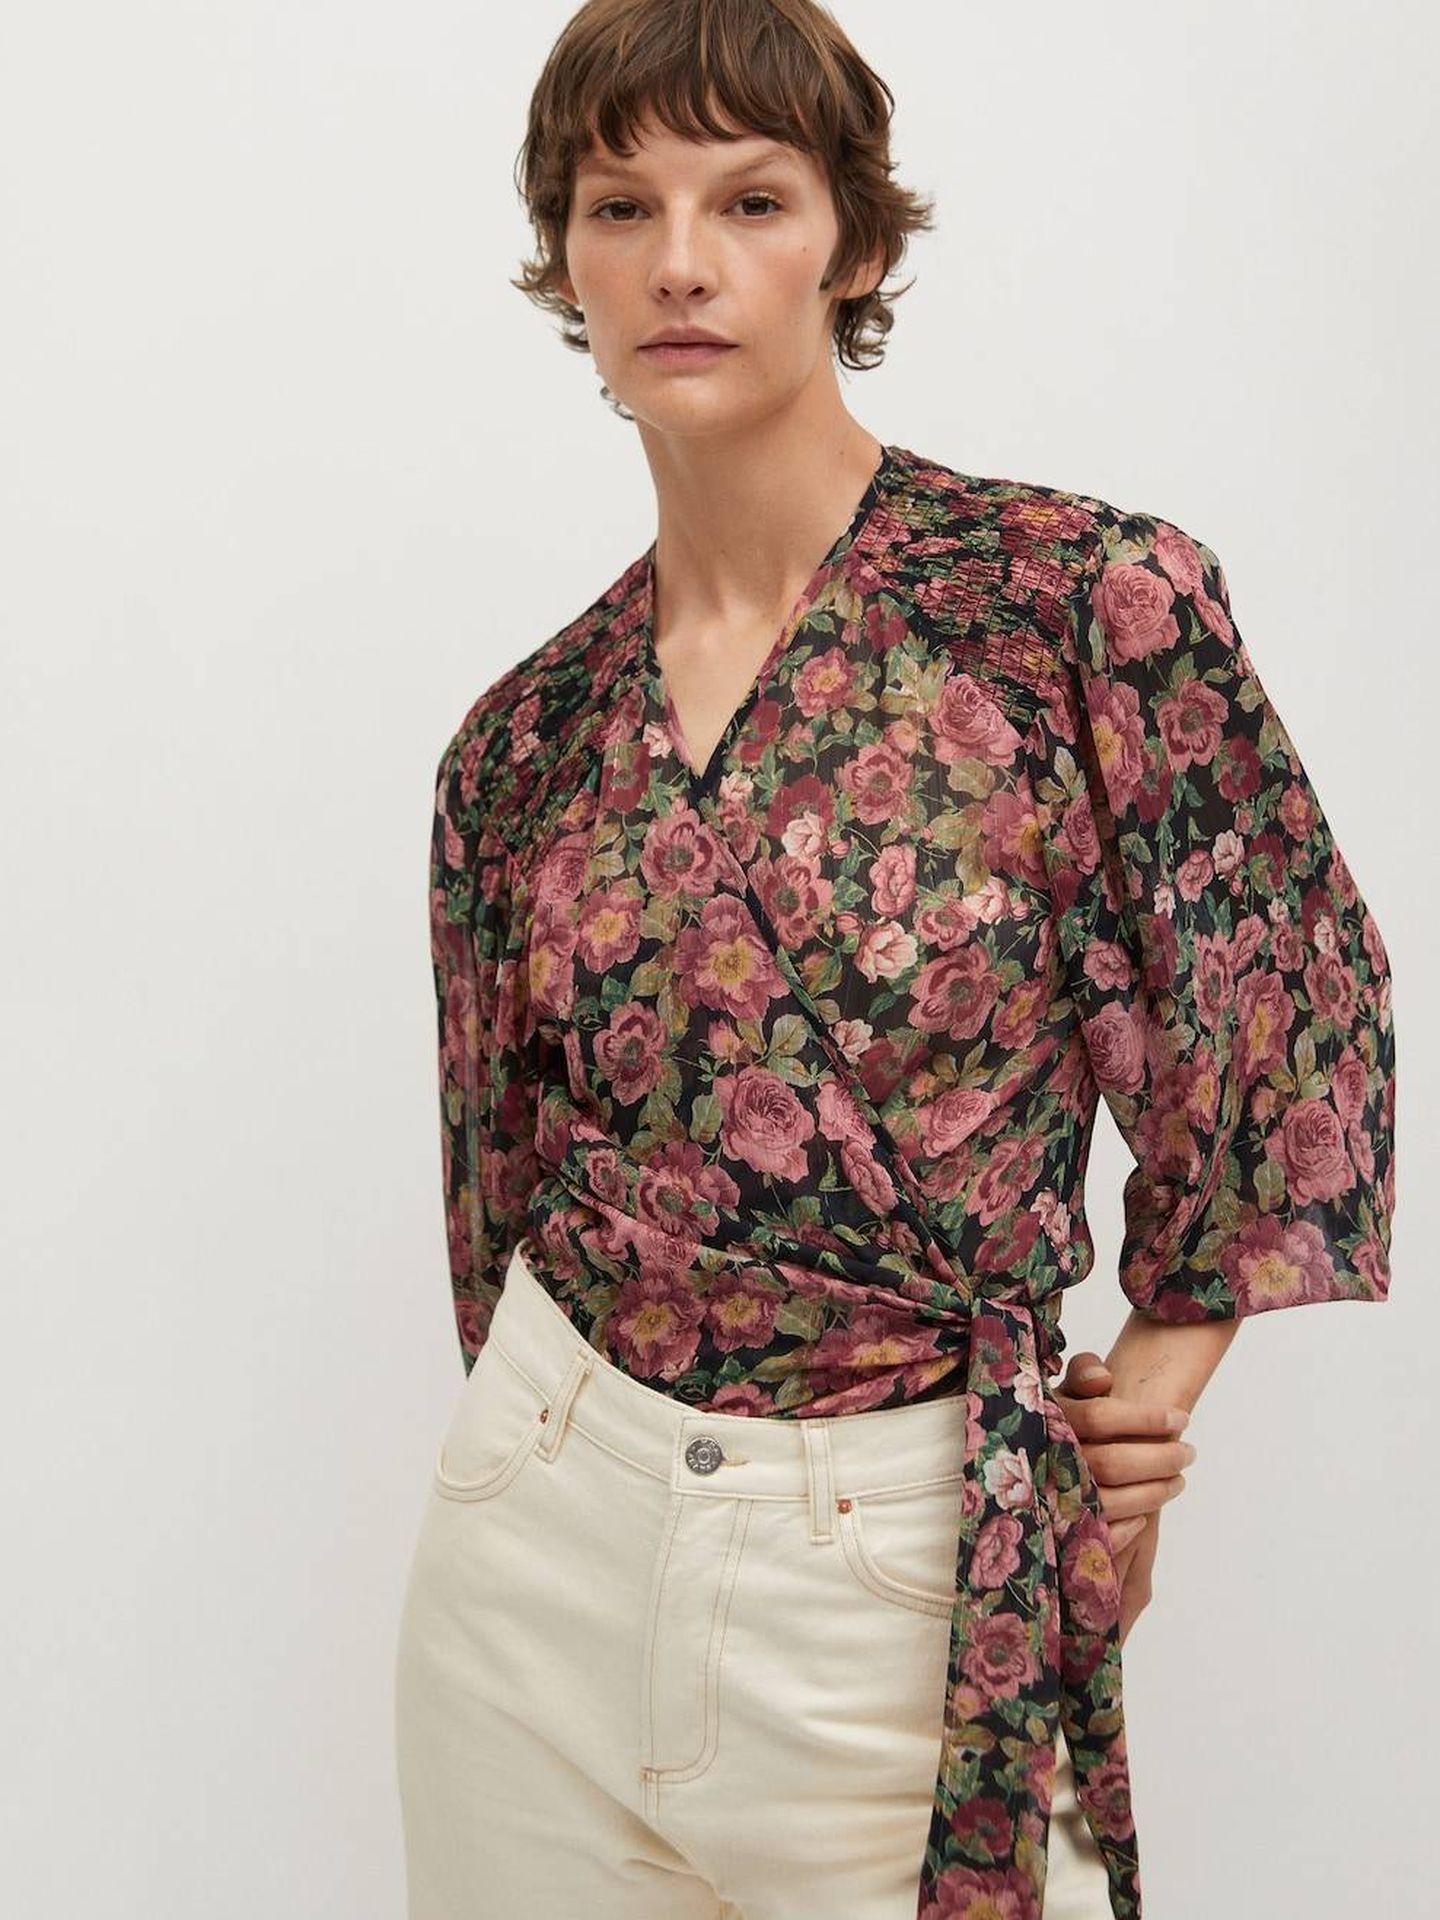 Blusa de flores de Mango. (Cortesía)